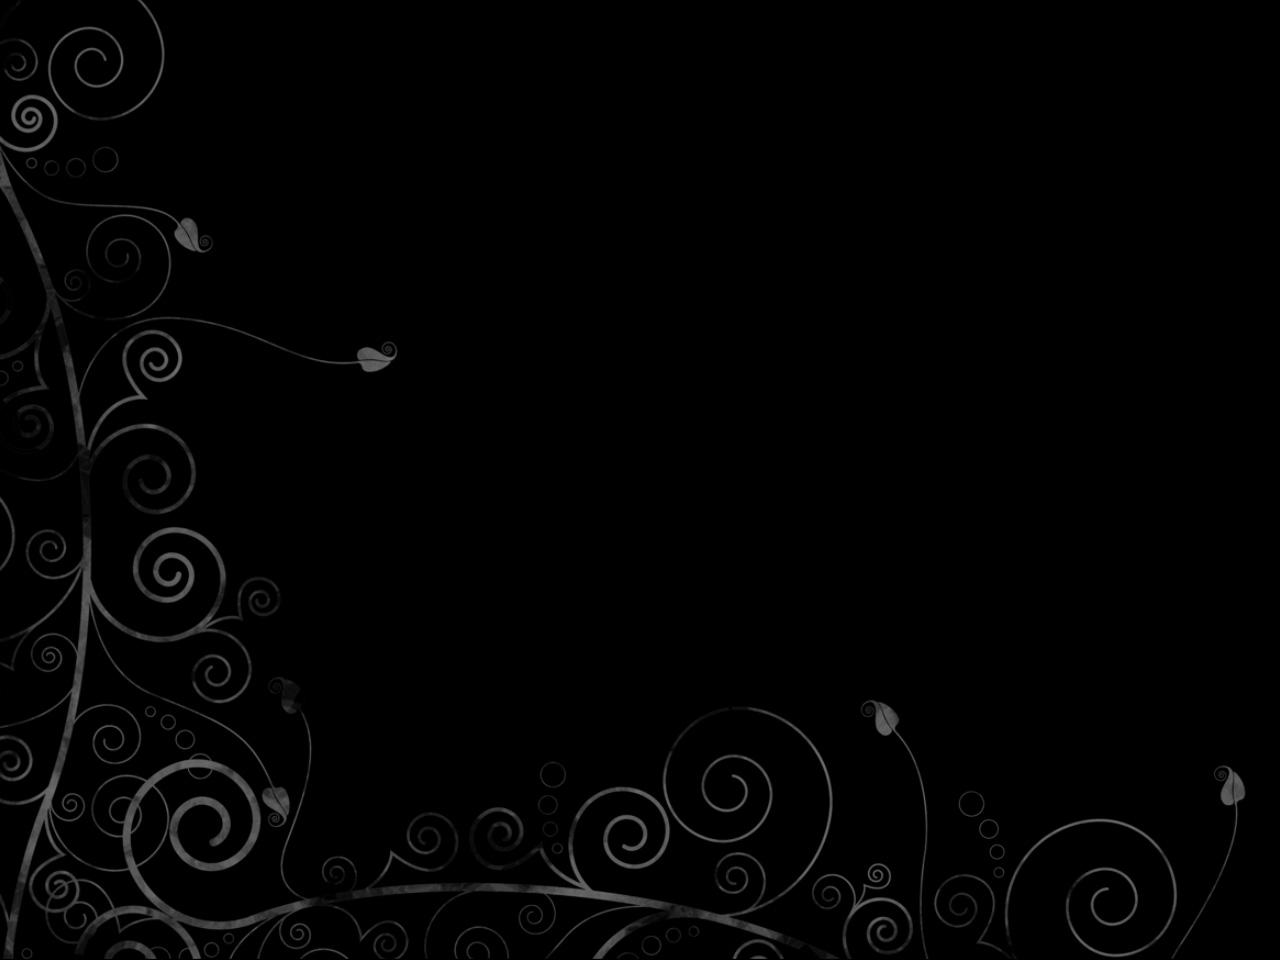 White And Black Wallpaper Designs 17 Background: صور خلفيات سوداء بجودة HD جميلة وكبيرة للتصميمات